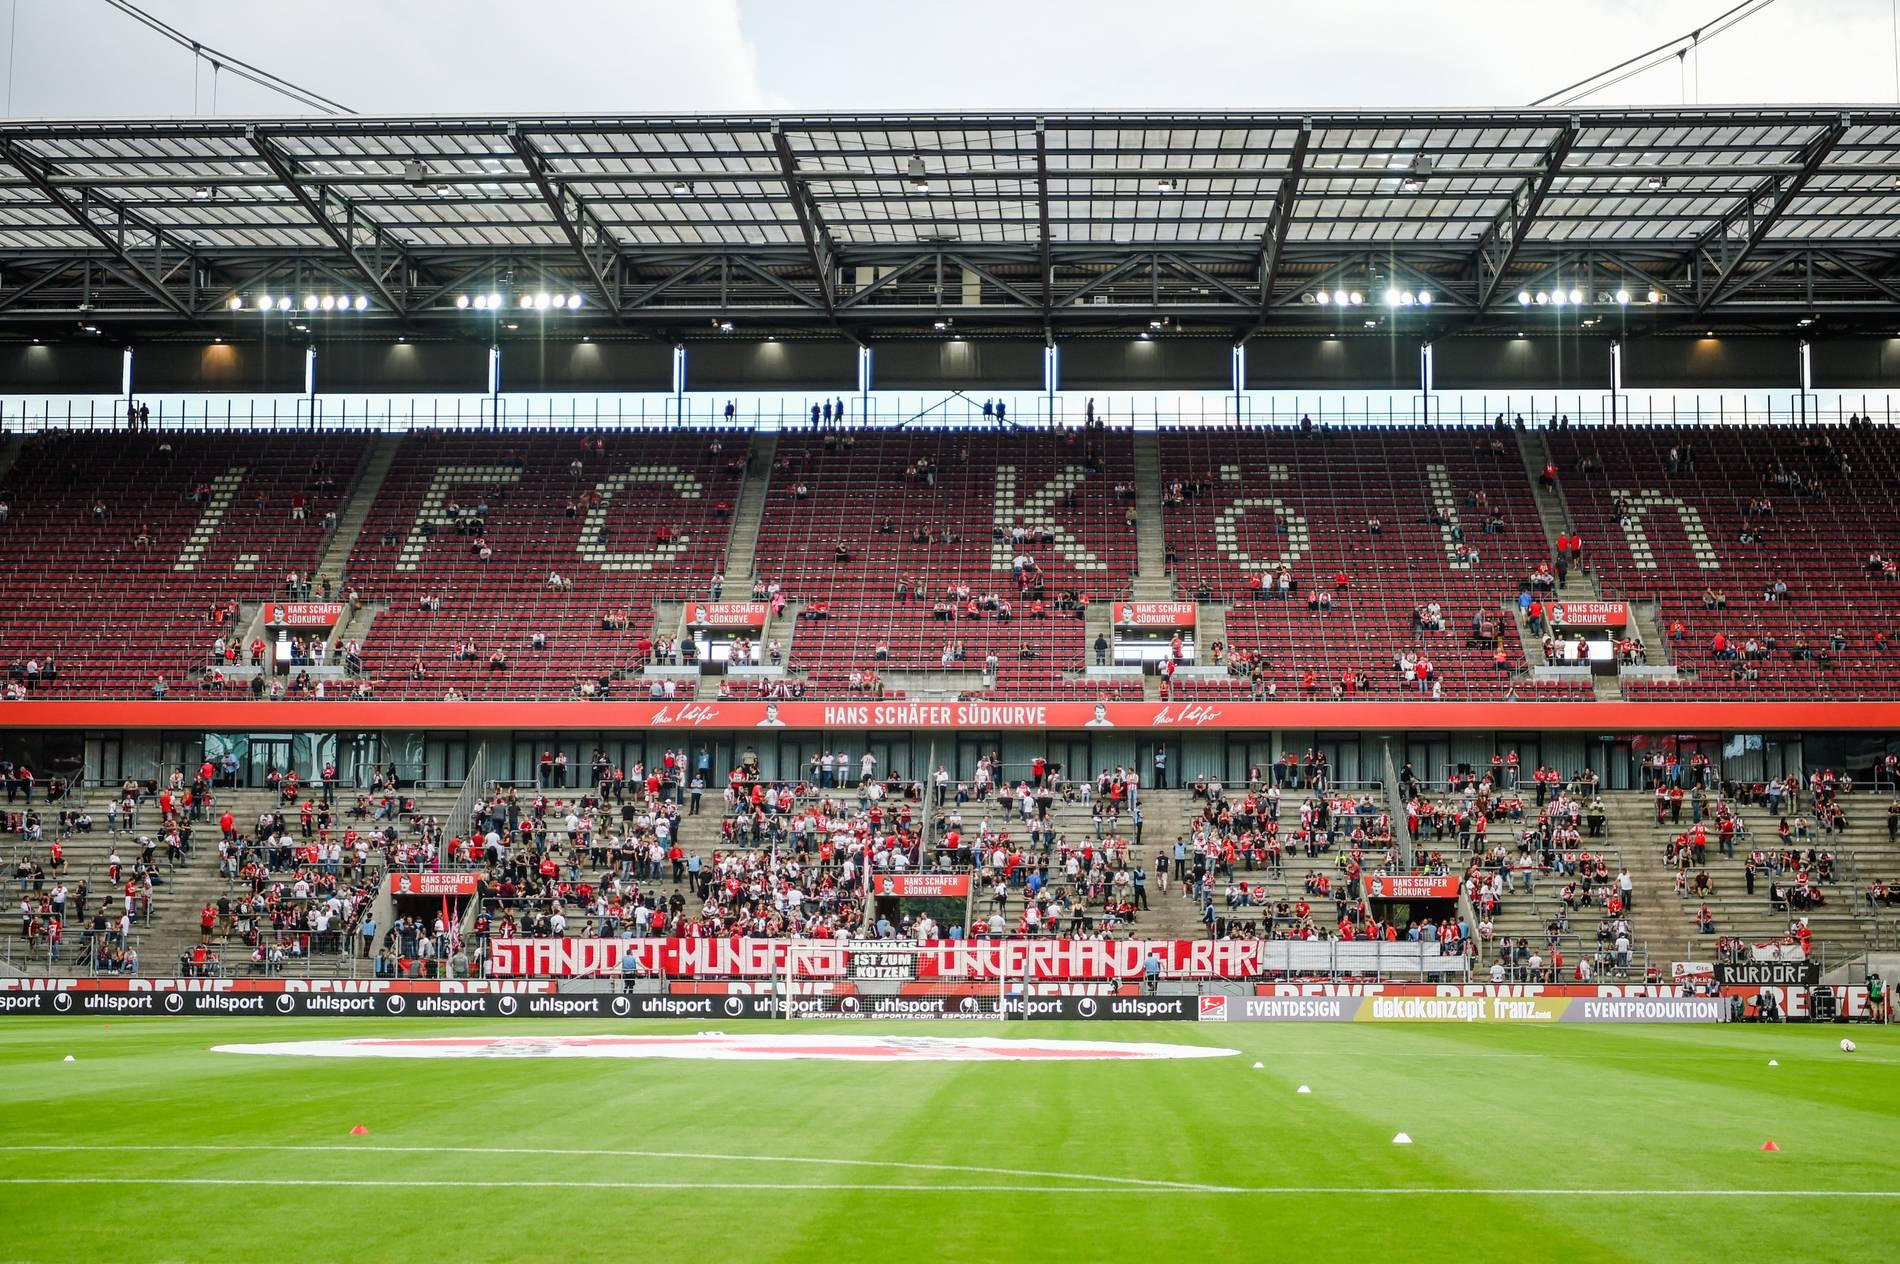 1 Fc Köln Manfred Schmid Kehrt Als Chefscout Zum Fc Zurück